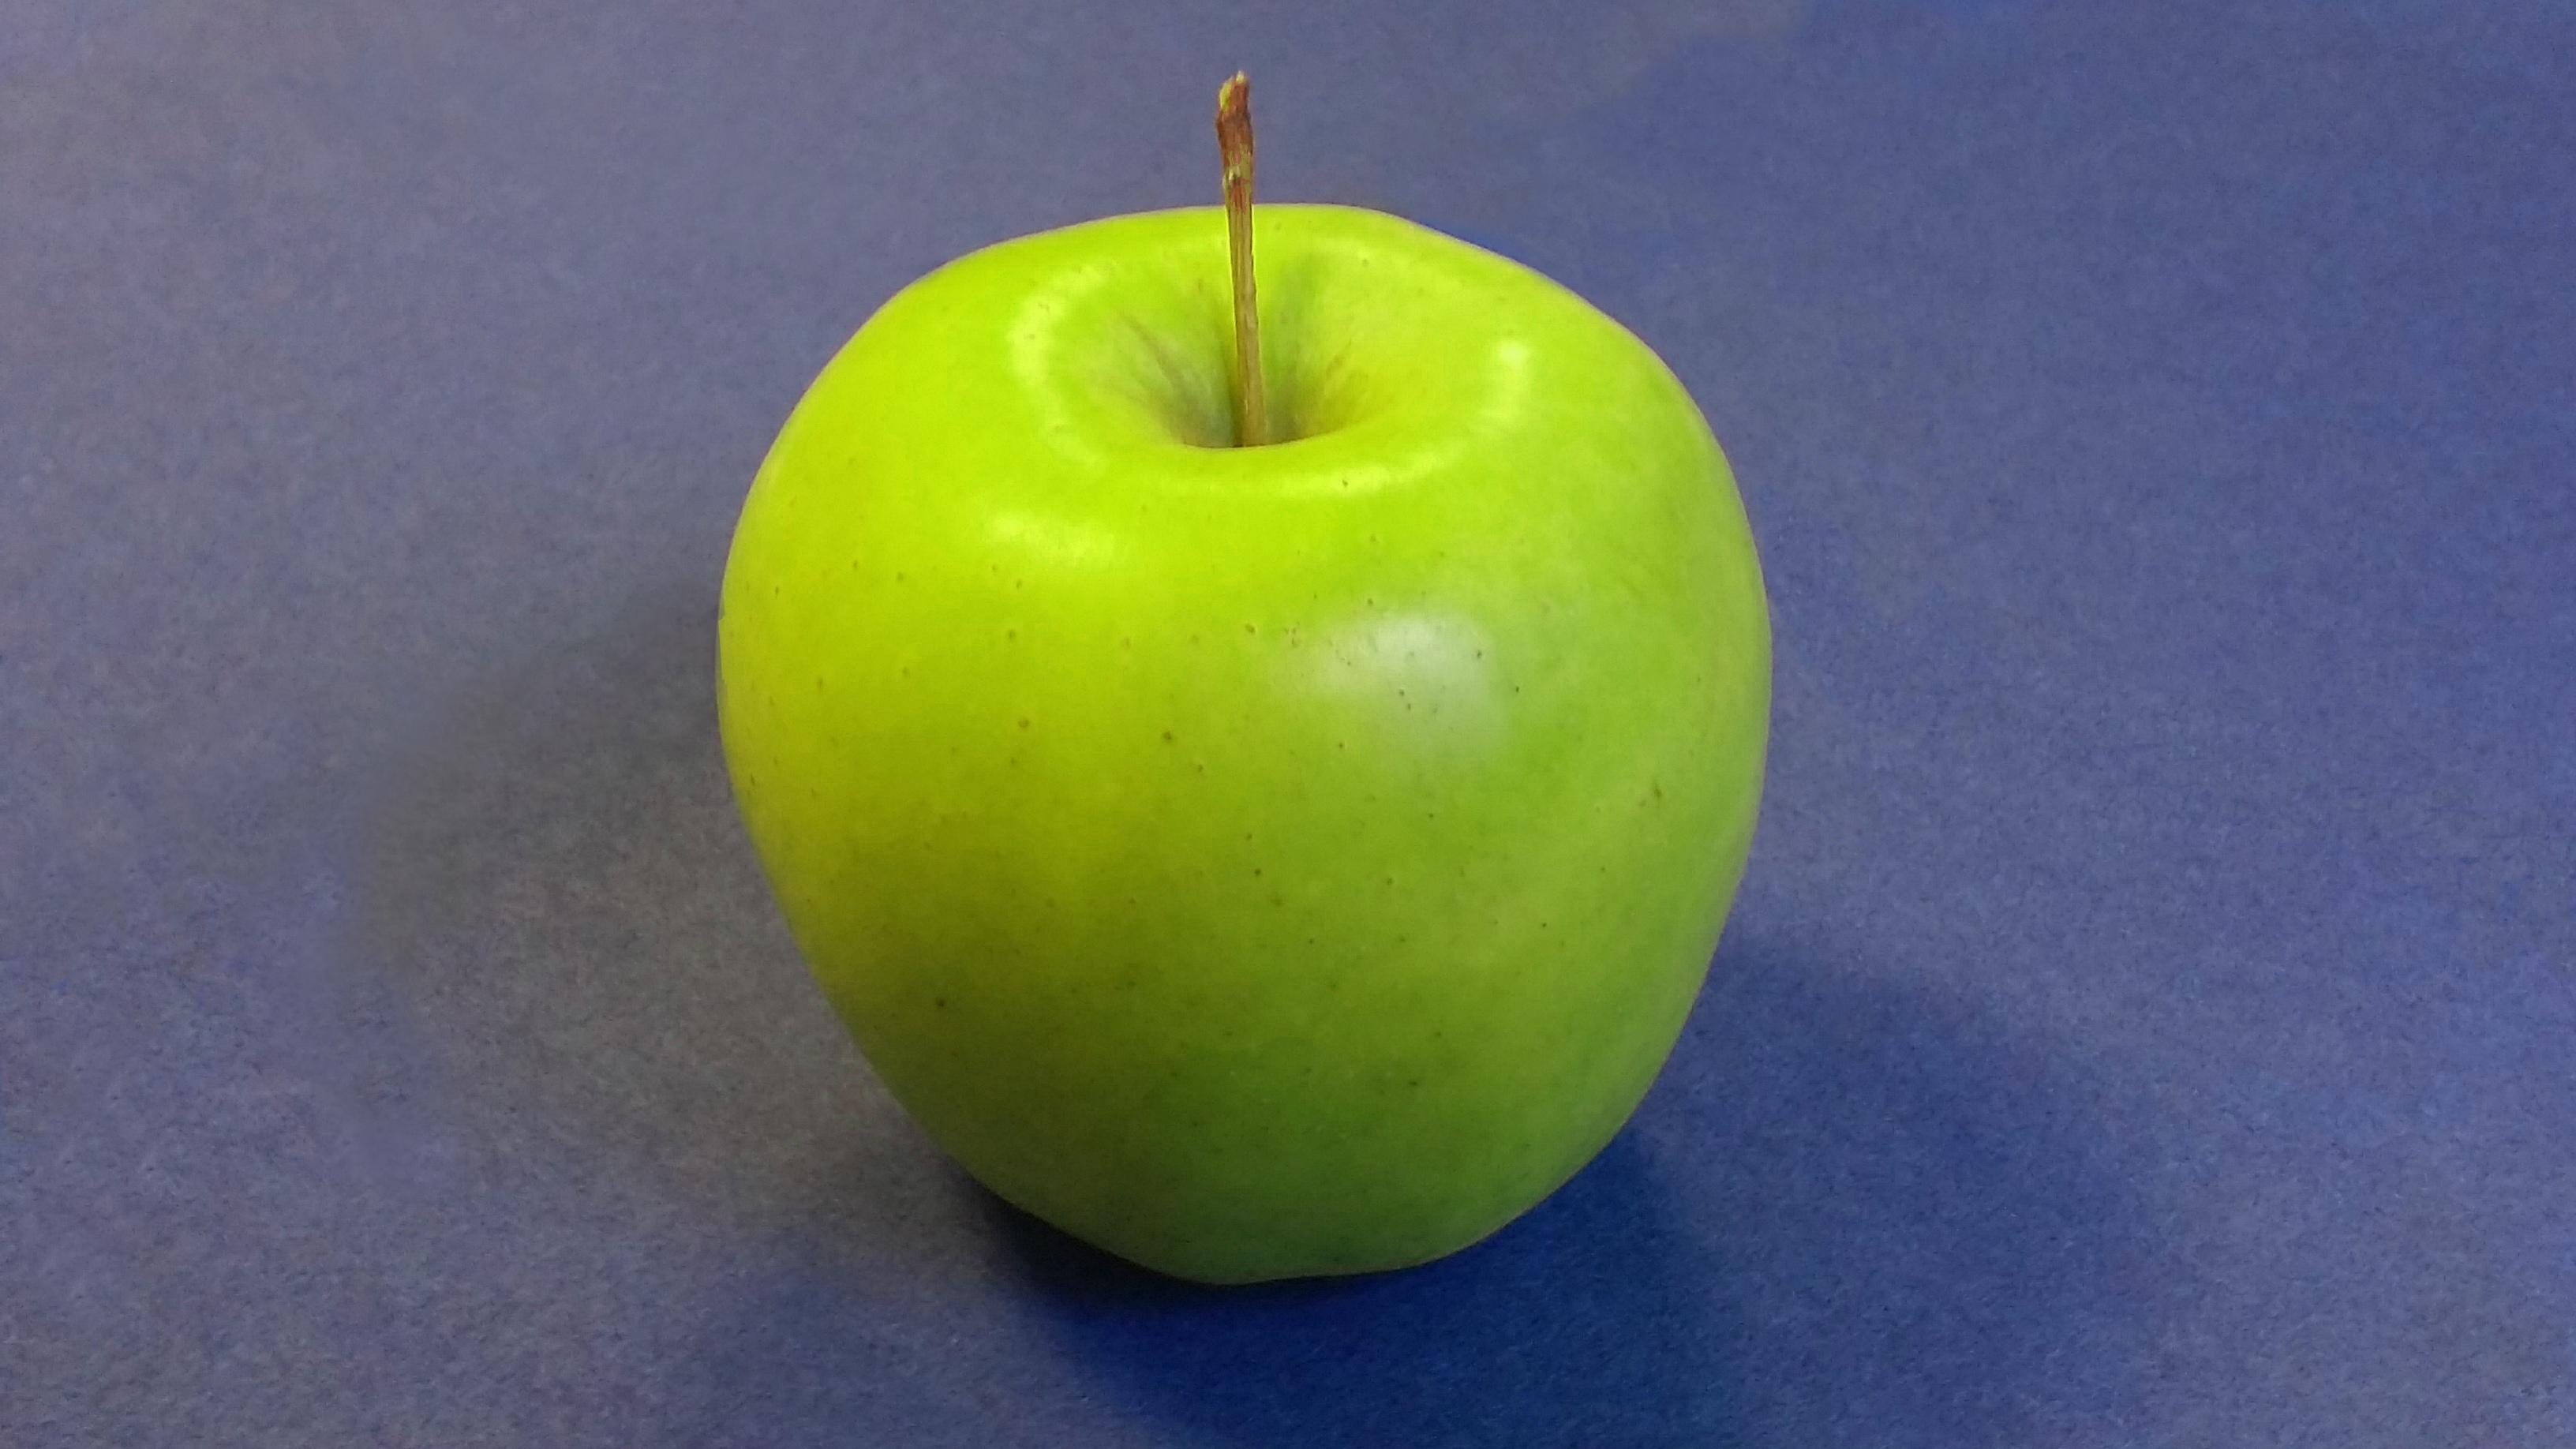 Ärzte.de Apfel oder Schokolade? Apfel